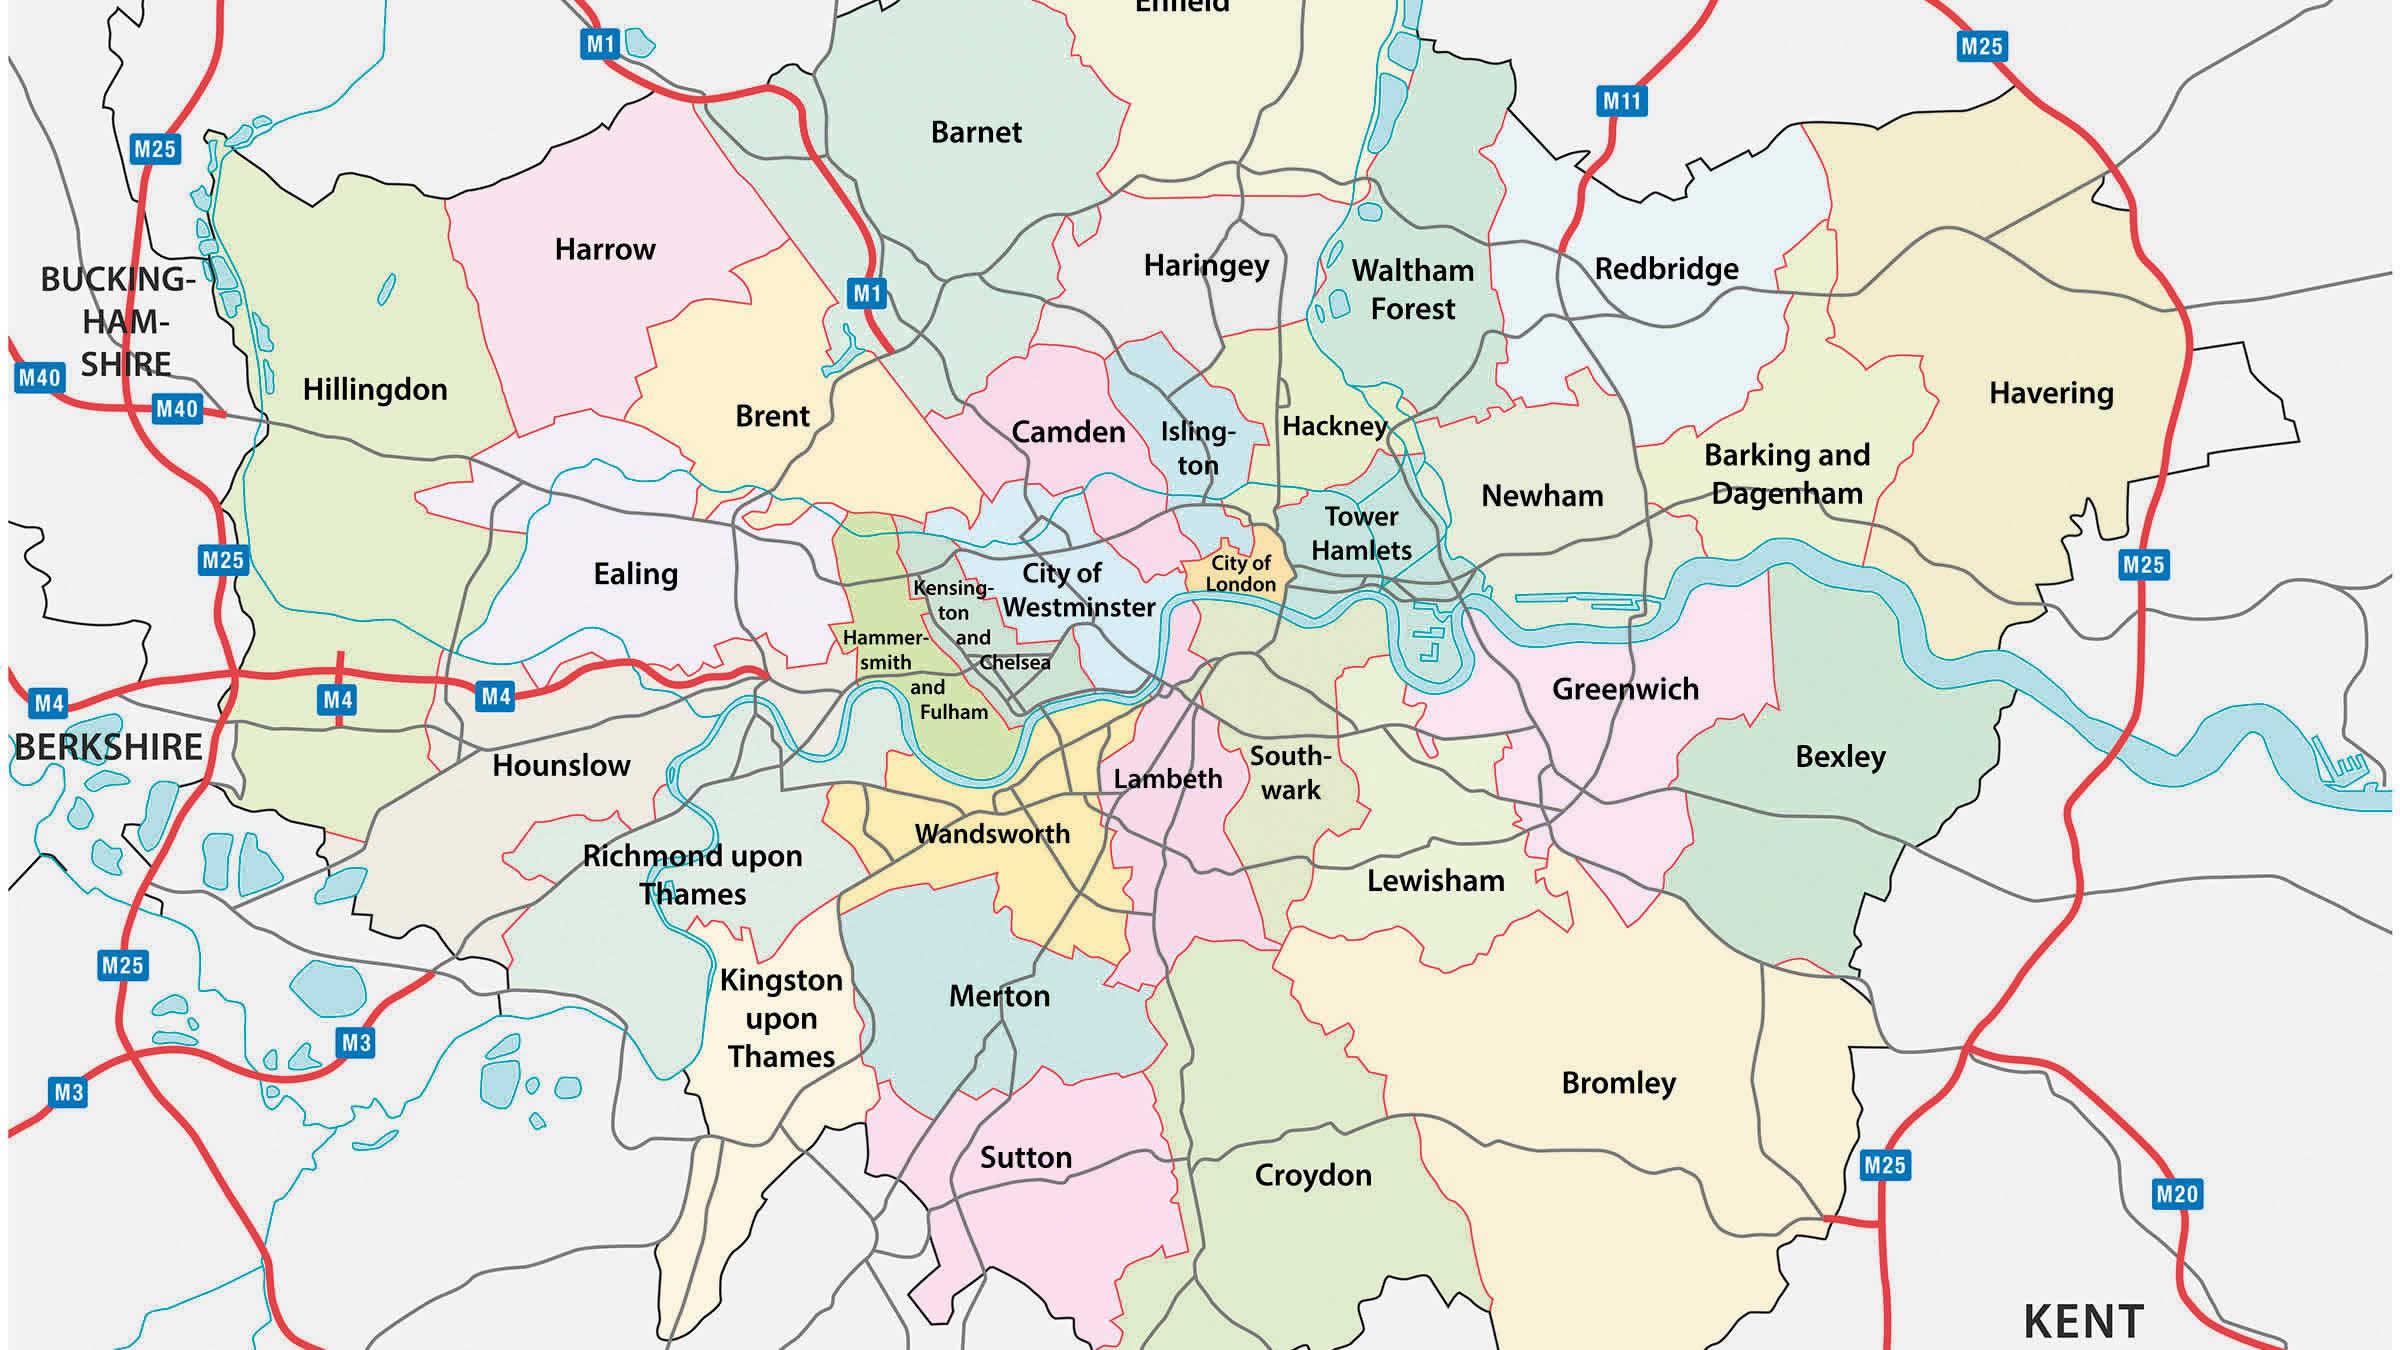 mapa satelite londres Mapa de los barrios o